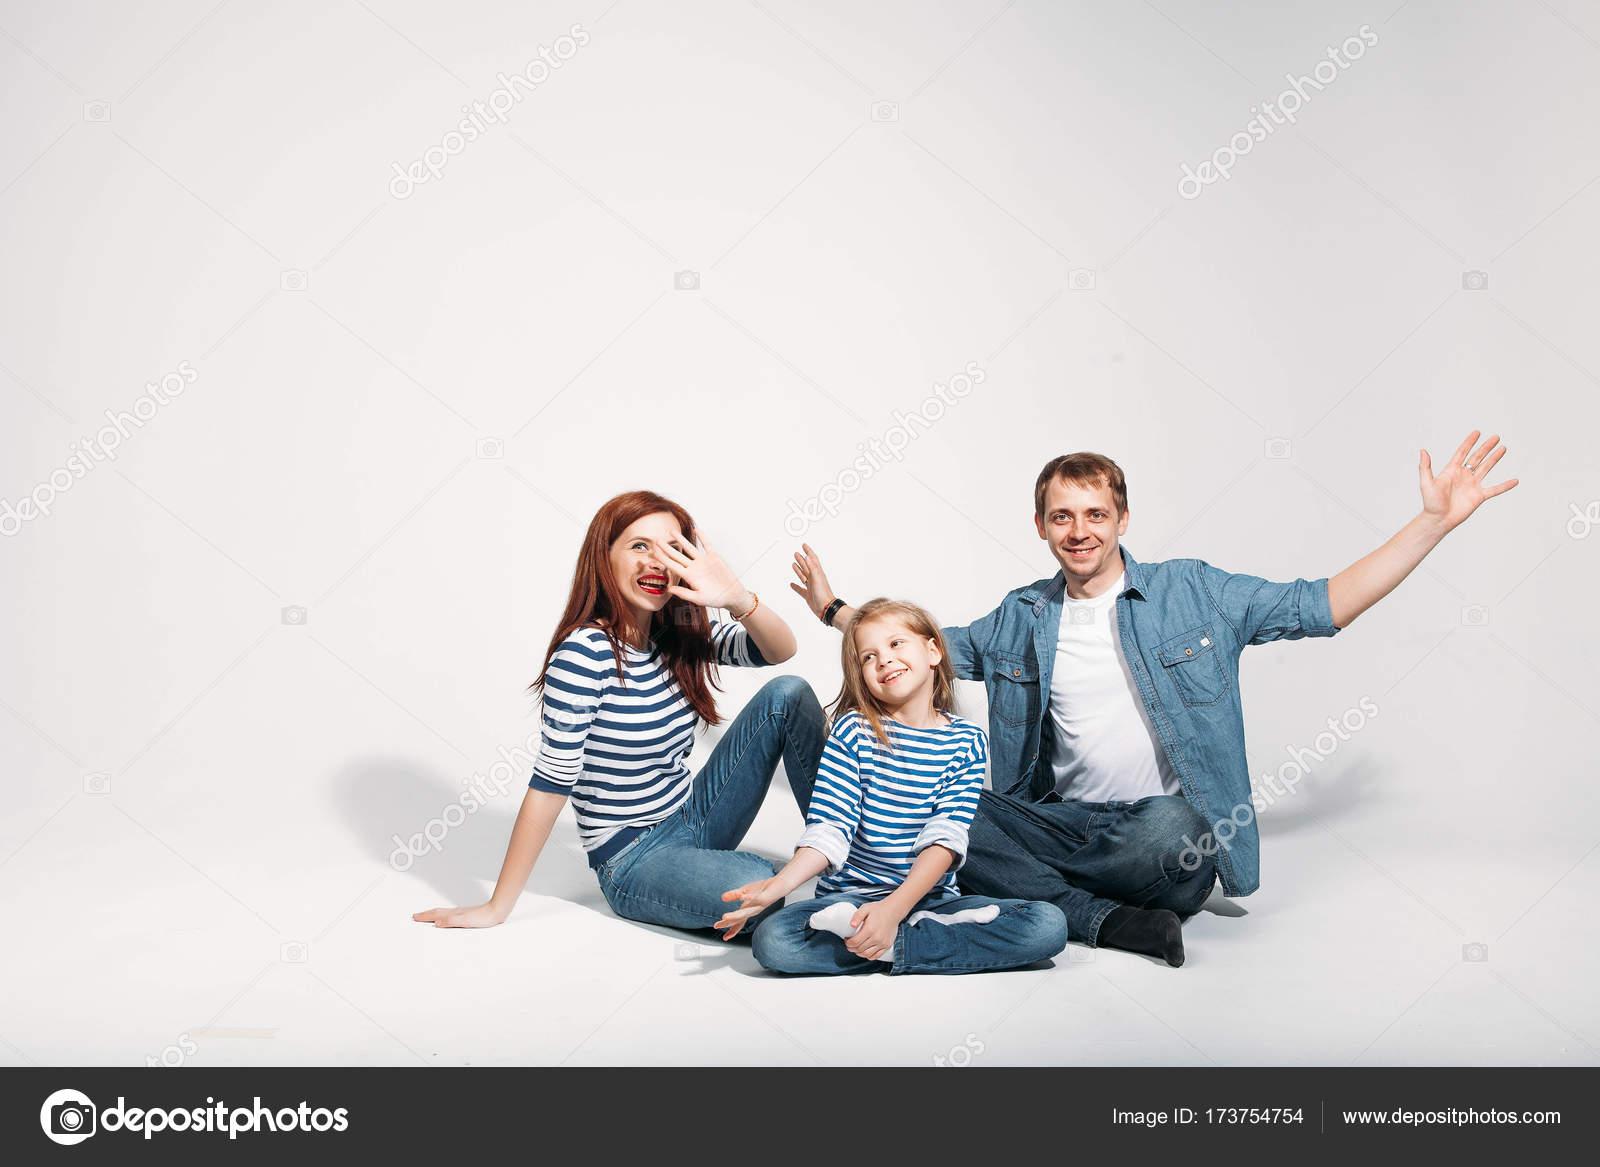 Happy family portrait sitting on white background isolated stock photo